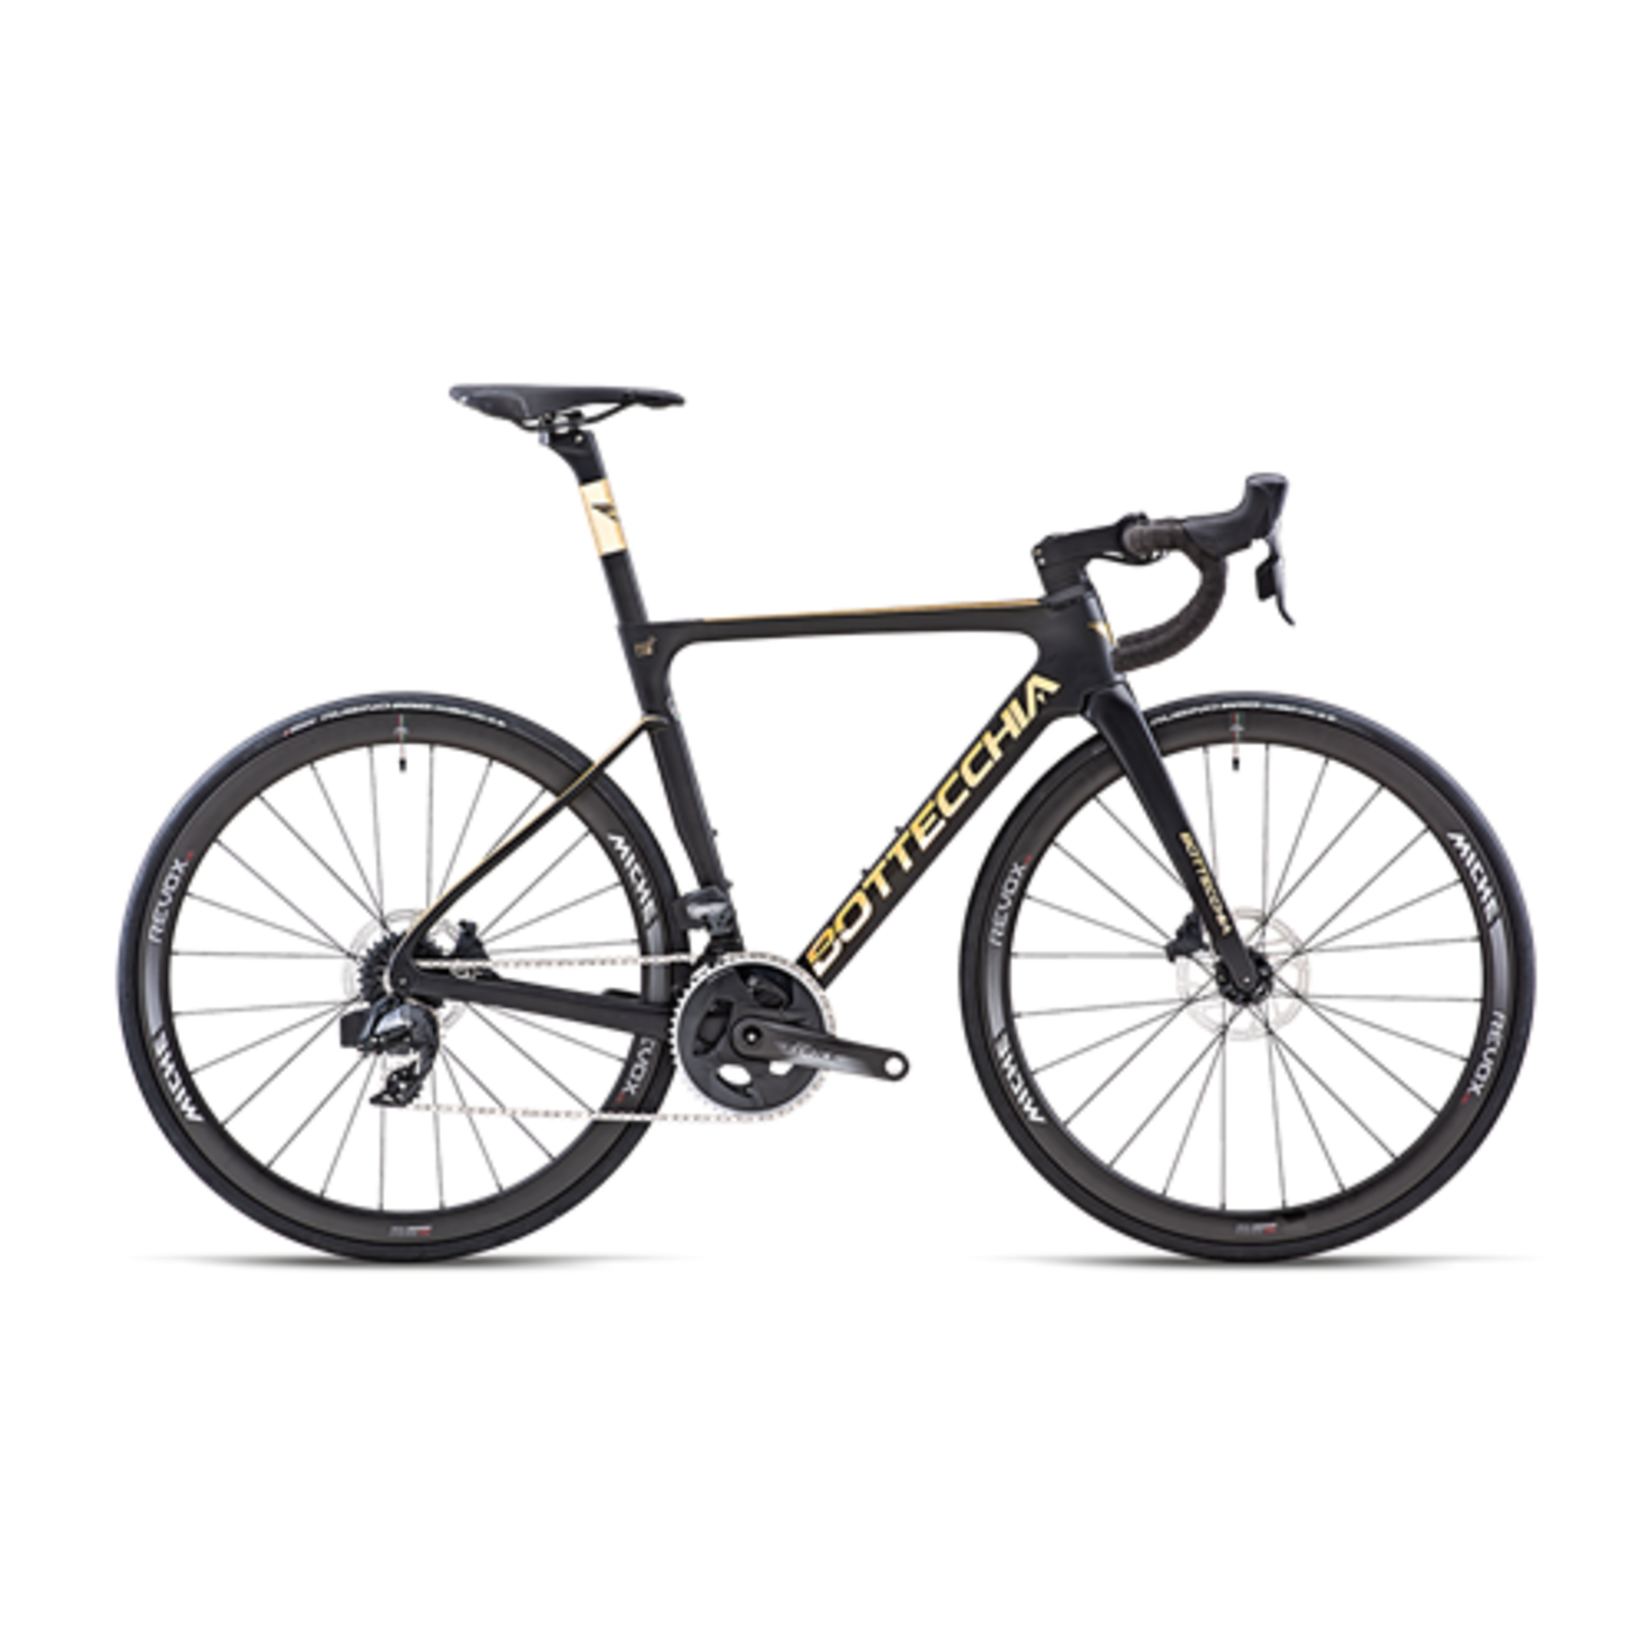 Bottecchia Bottecchia Aerospace black gold LTD edition 53 cm frameset